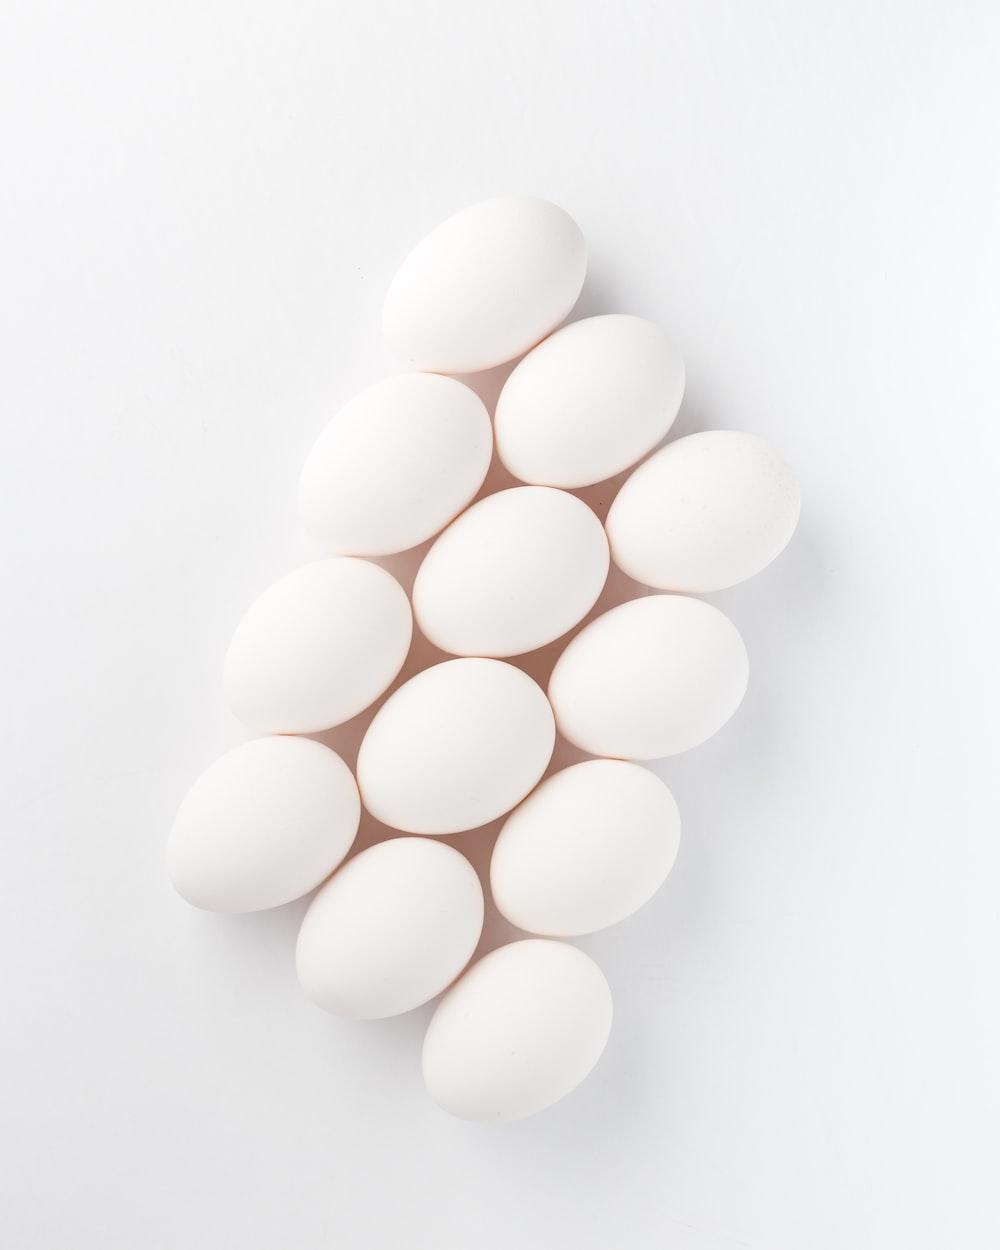 twelve white eggs on white surface